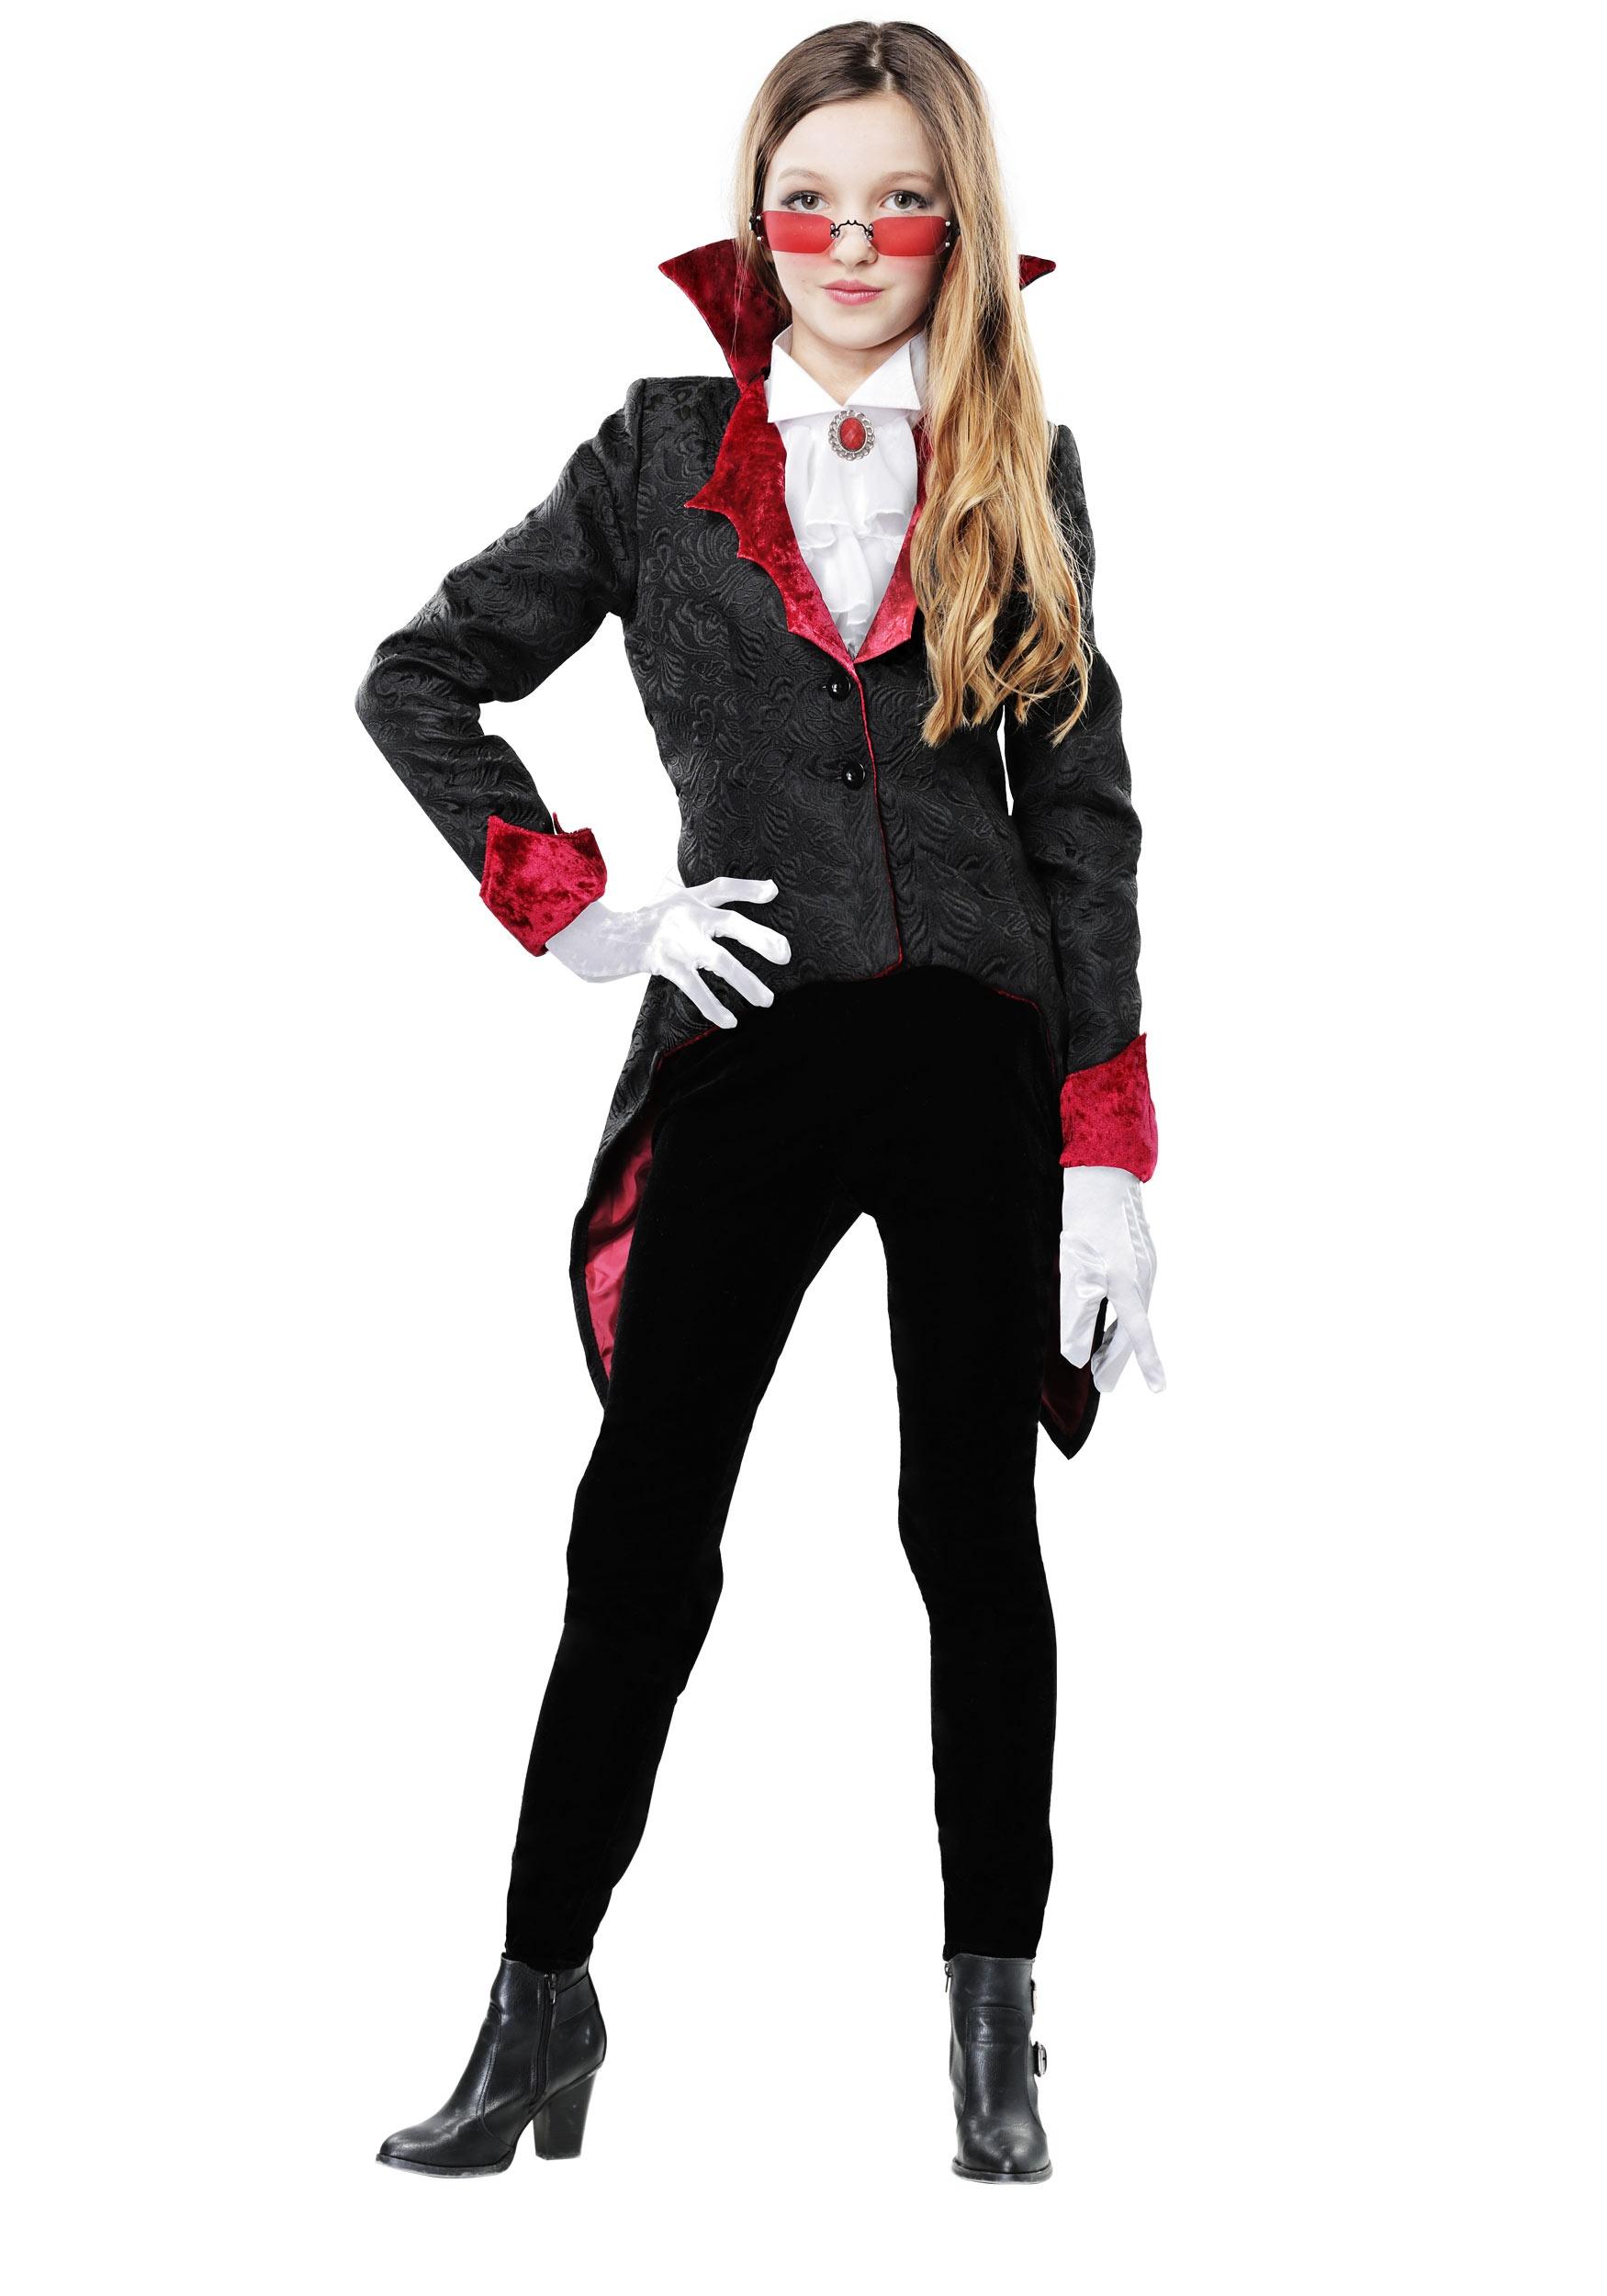 vampire costumes & outfits - halloweencostumes